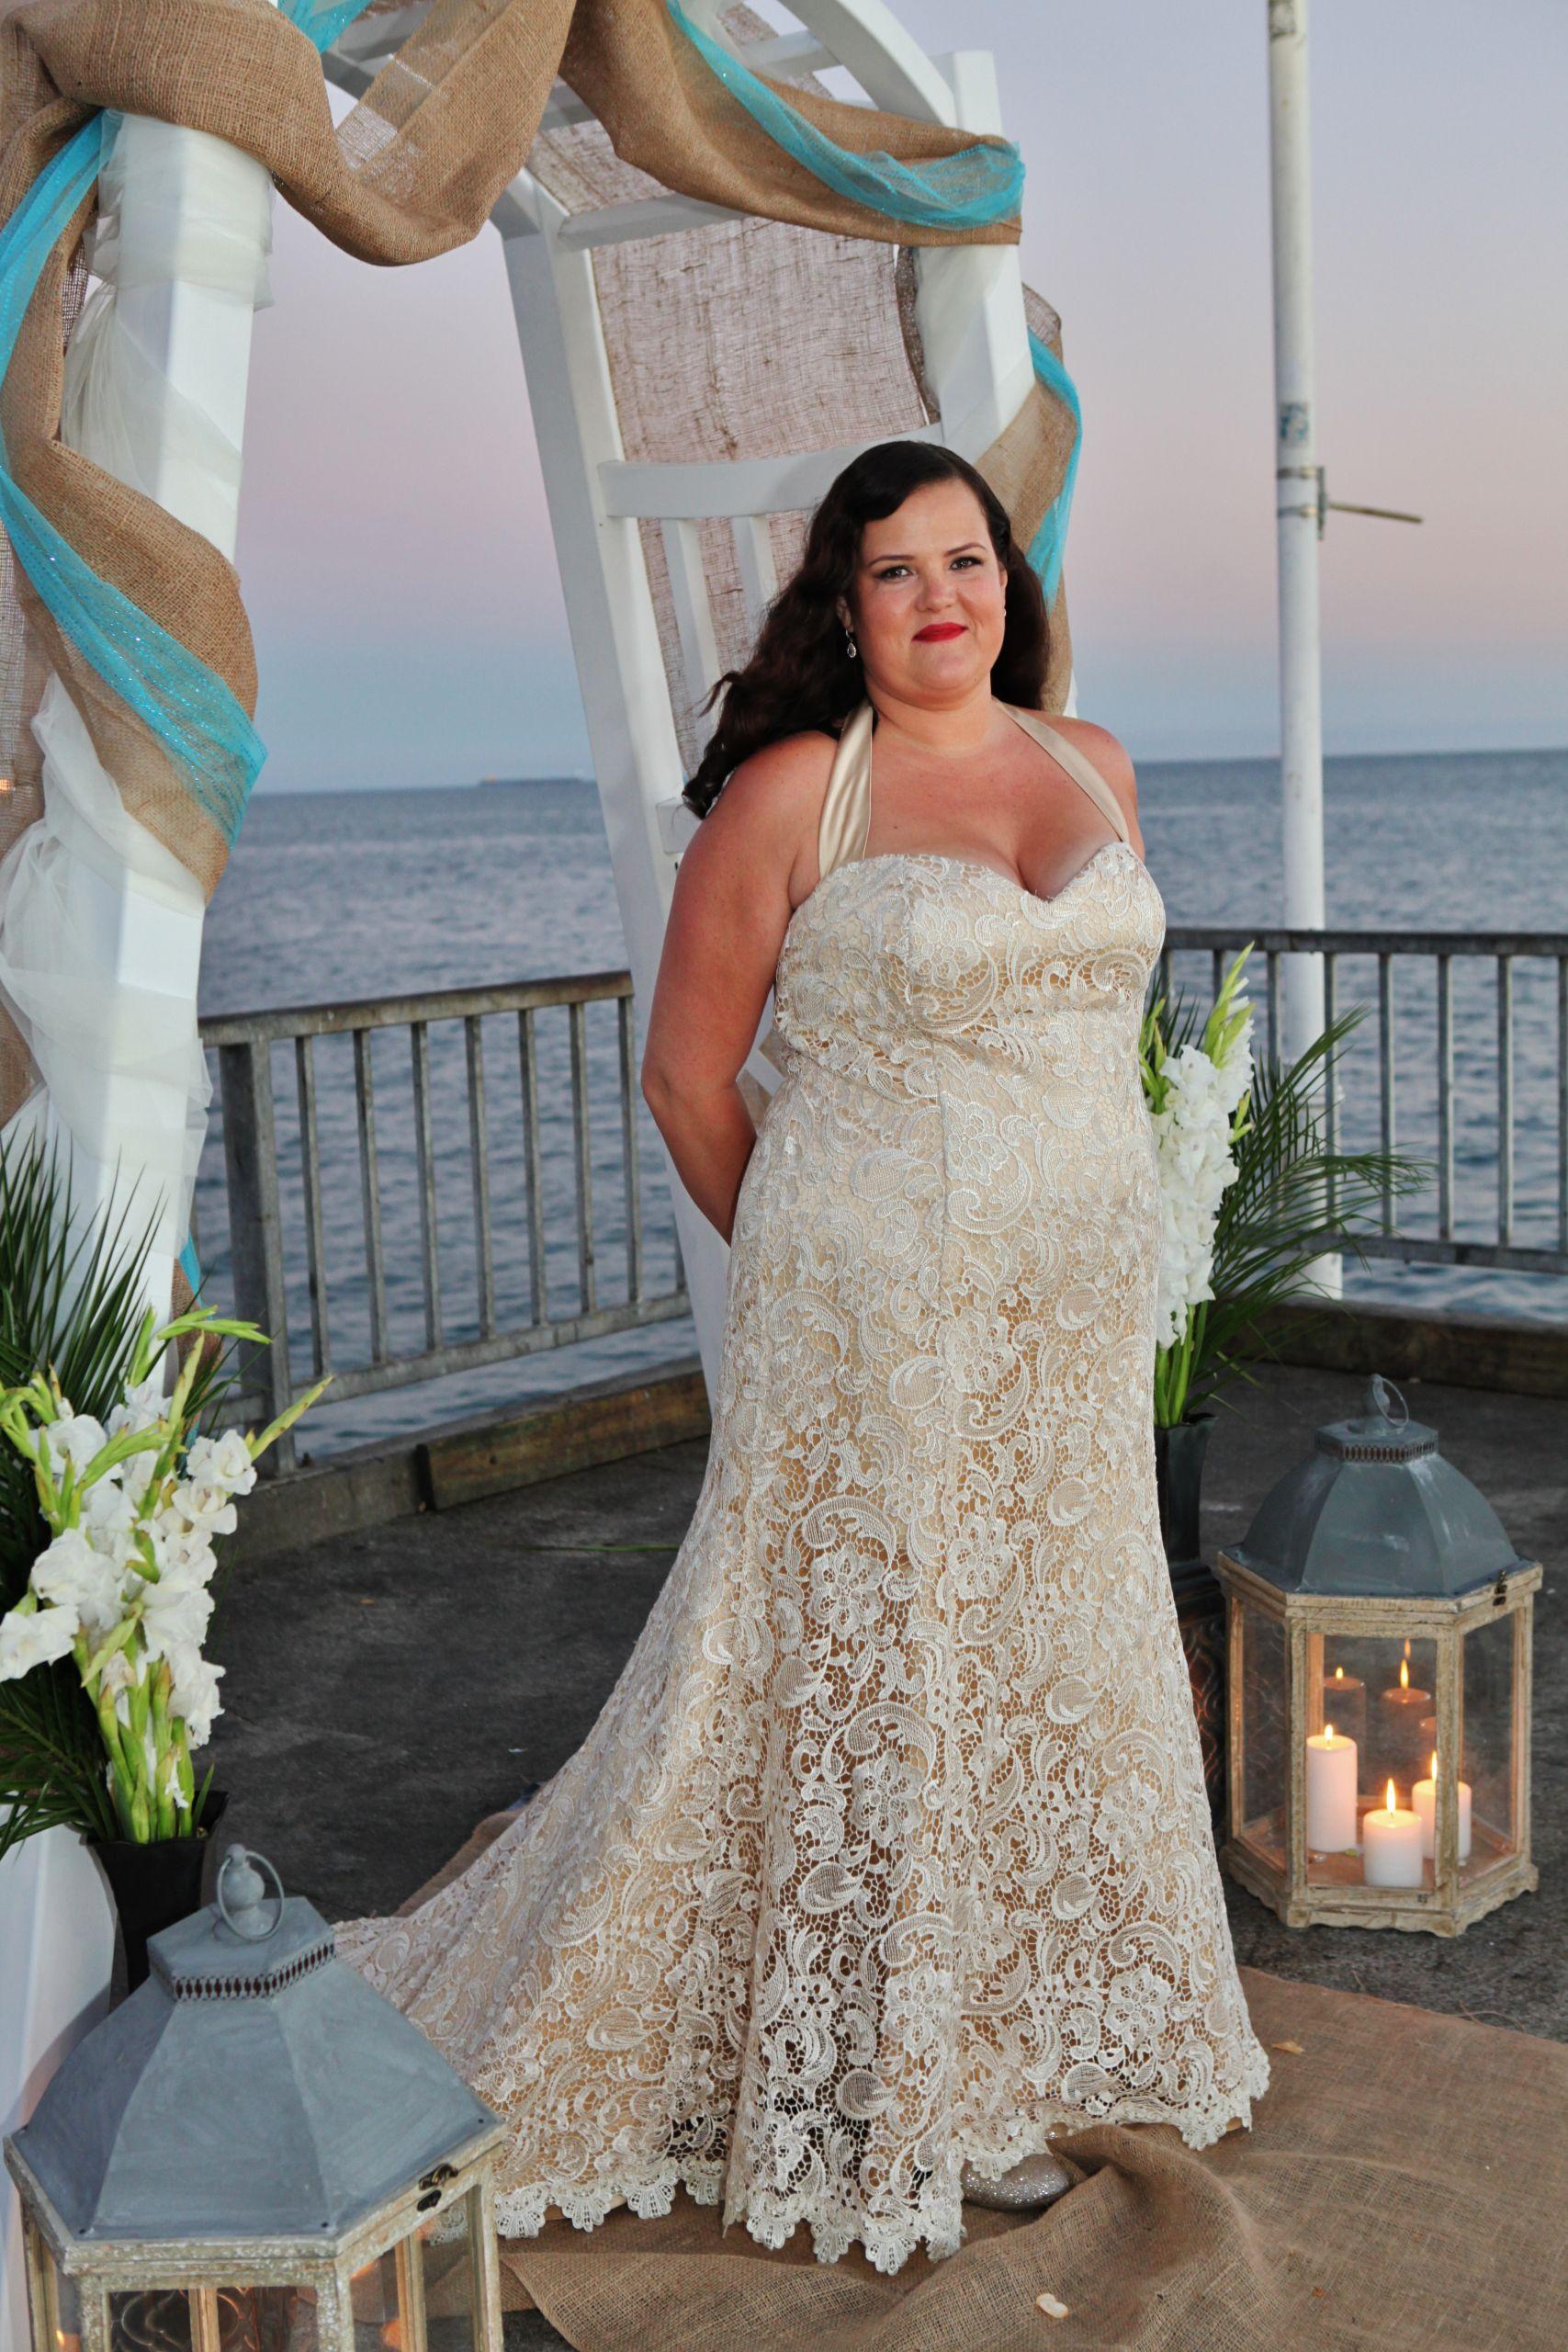 Champagne Wedding Gowns  Haydee s Champagne Lace Trumpet Wedding Dress Strut